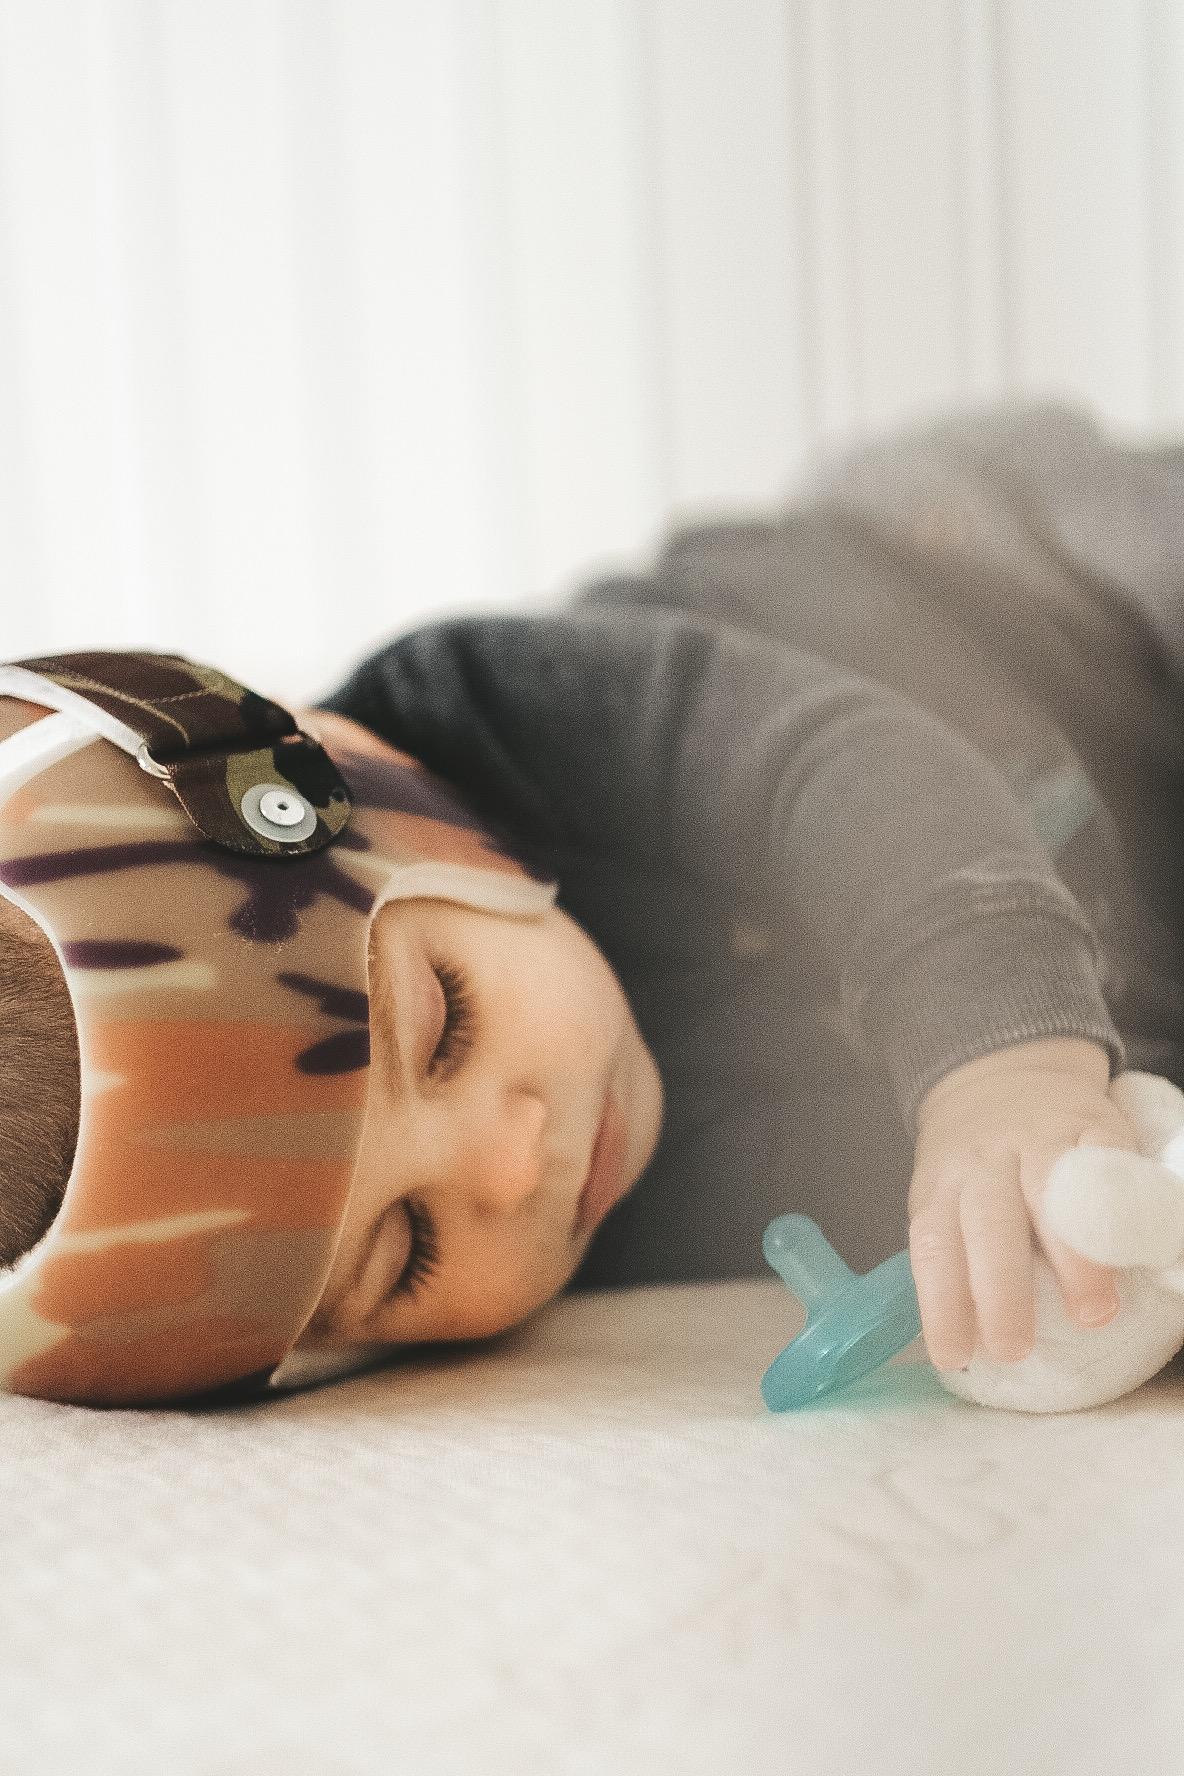 Newborn sleeping tips.  Best baby mattress.  Moonlight slumber baby bluebird crib mattress.  Helmet treatment for Plagiocephaly aka flat head.